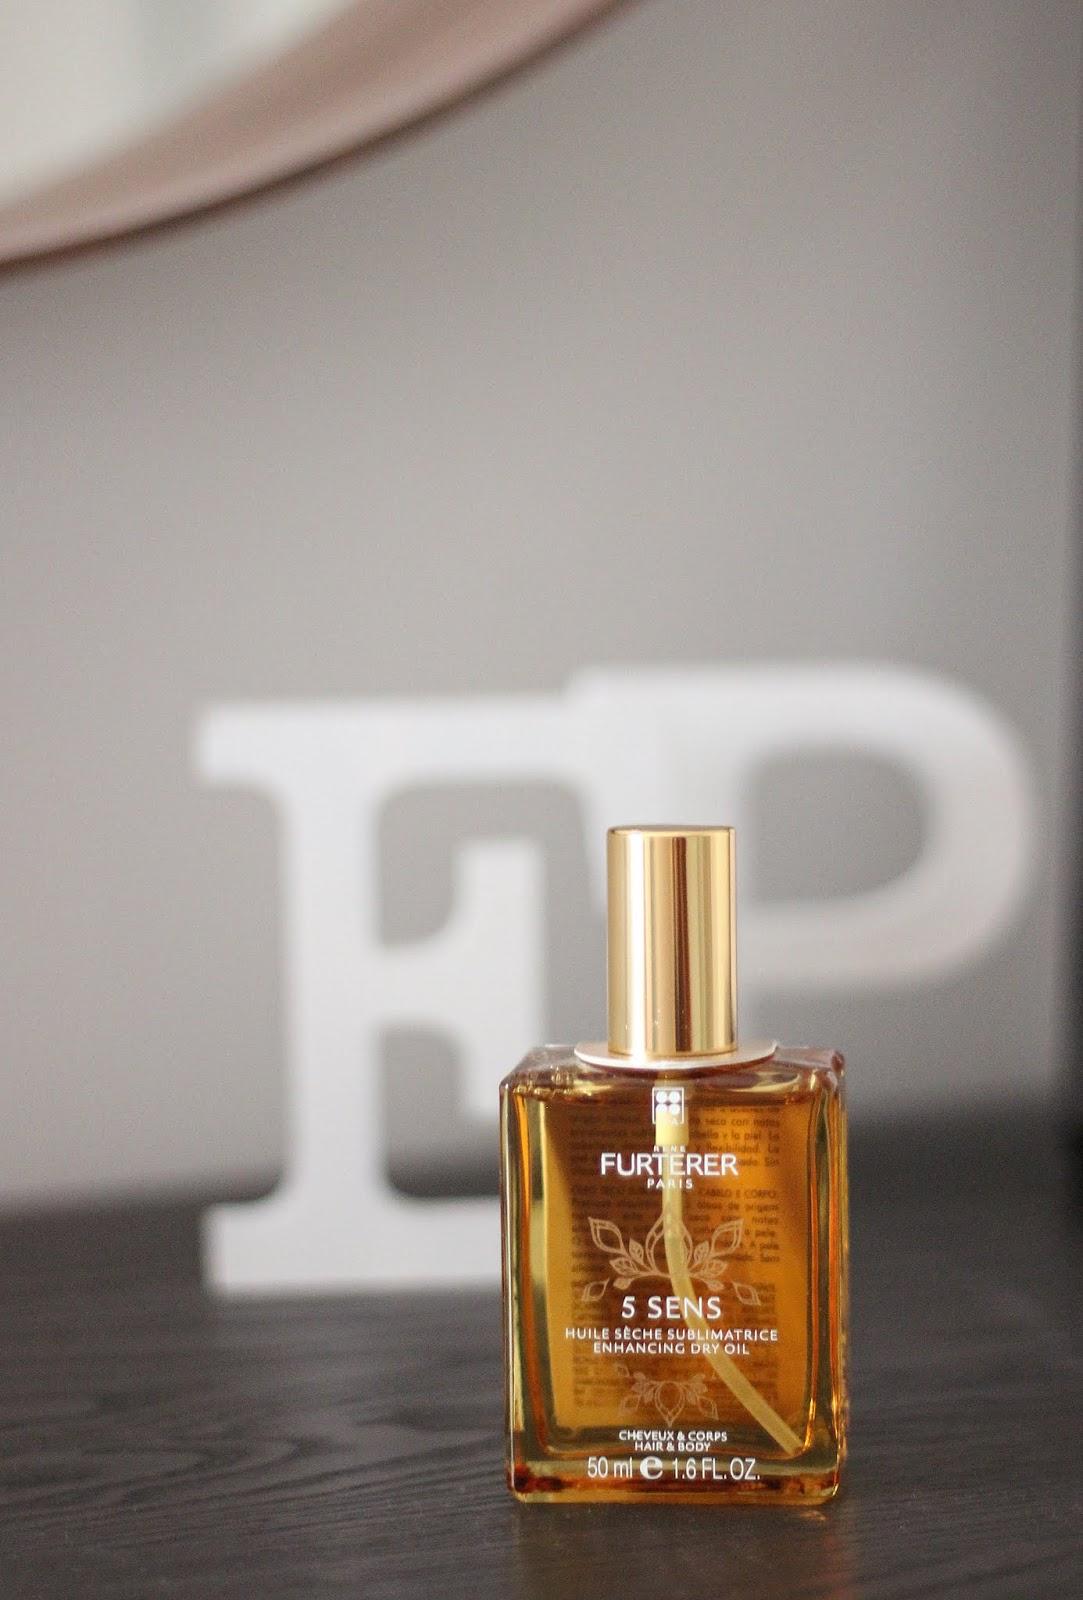 10-novedades-beauty-rene-furterer-5-sens-aceite